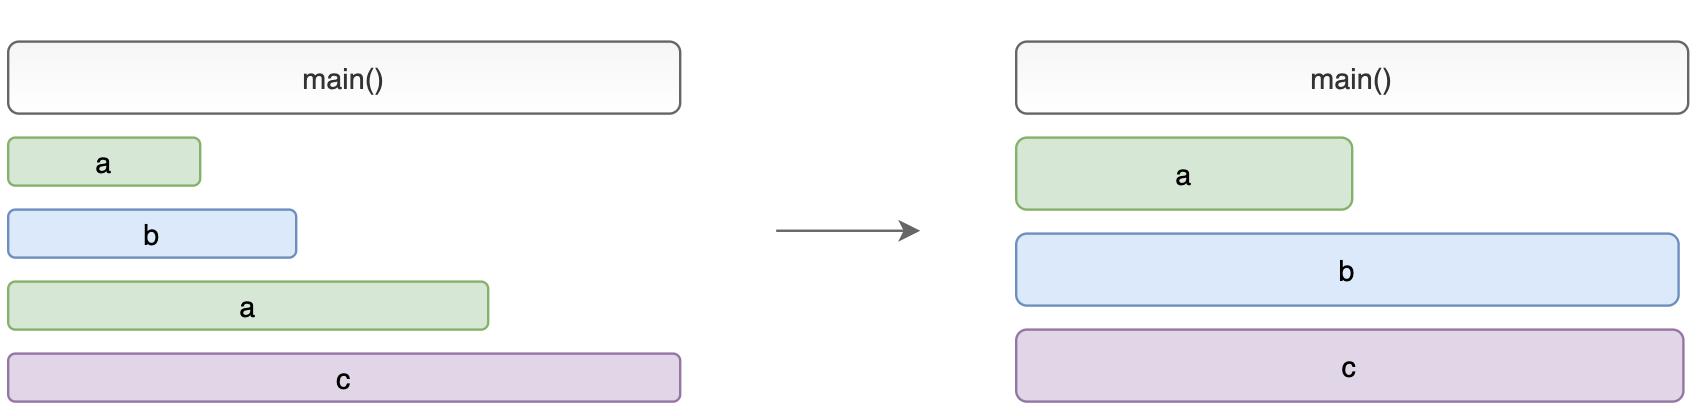 Demonstrating collapsed recursive calls